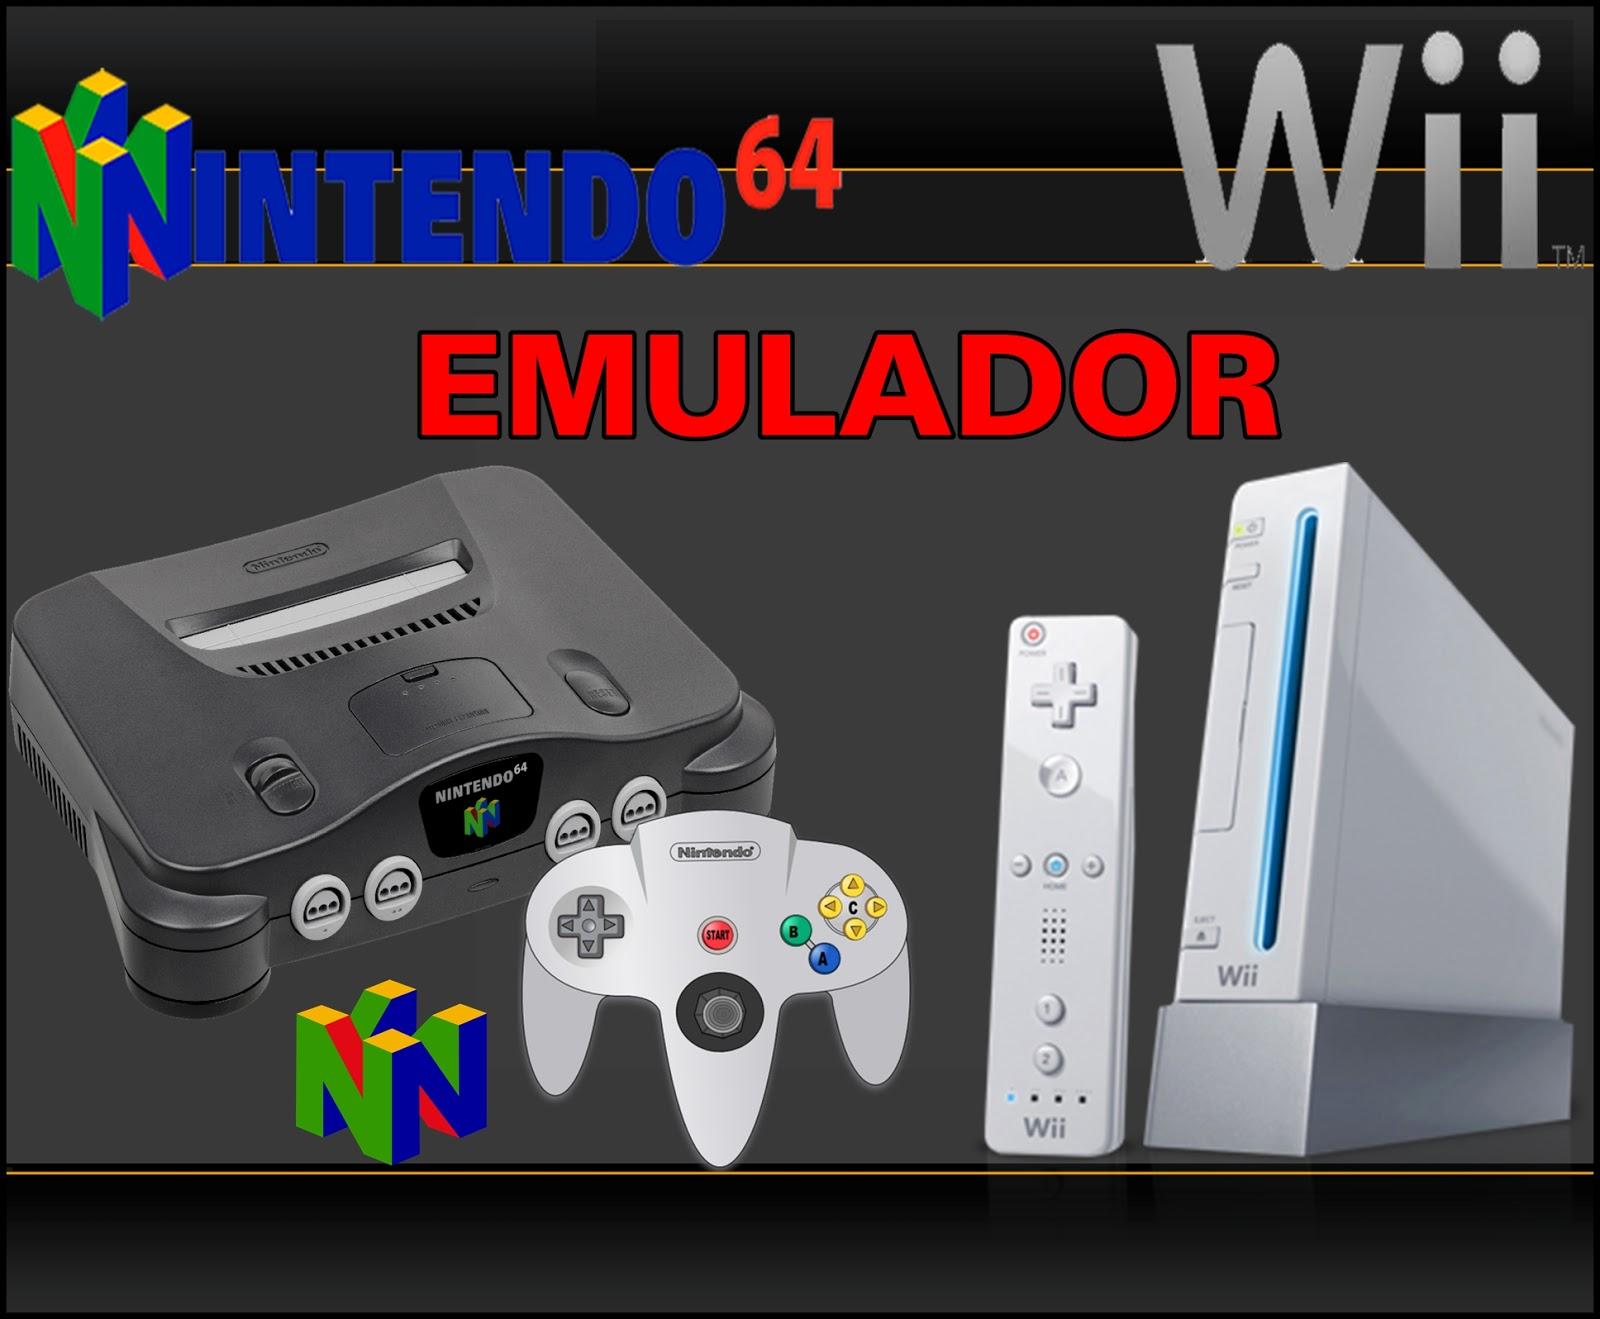 Wii Mod Brasil: Emulador Nintendo 64 (not64)- Nintendo Wii